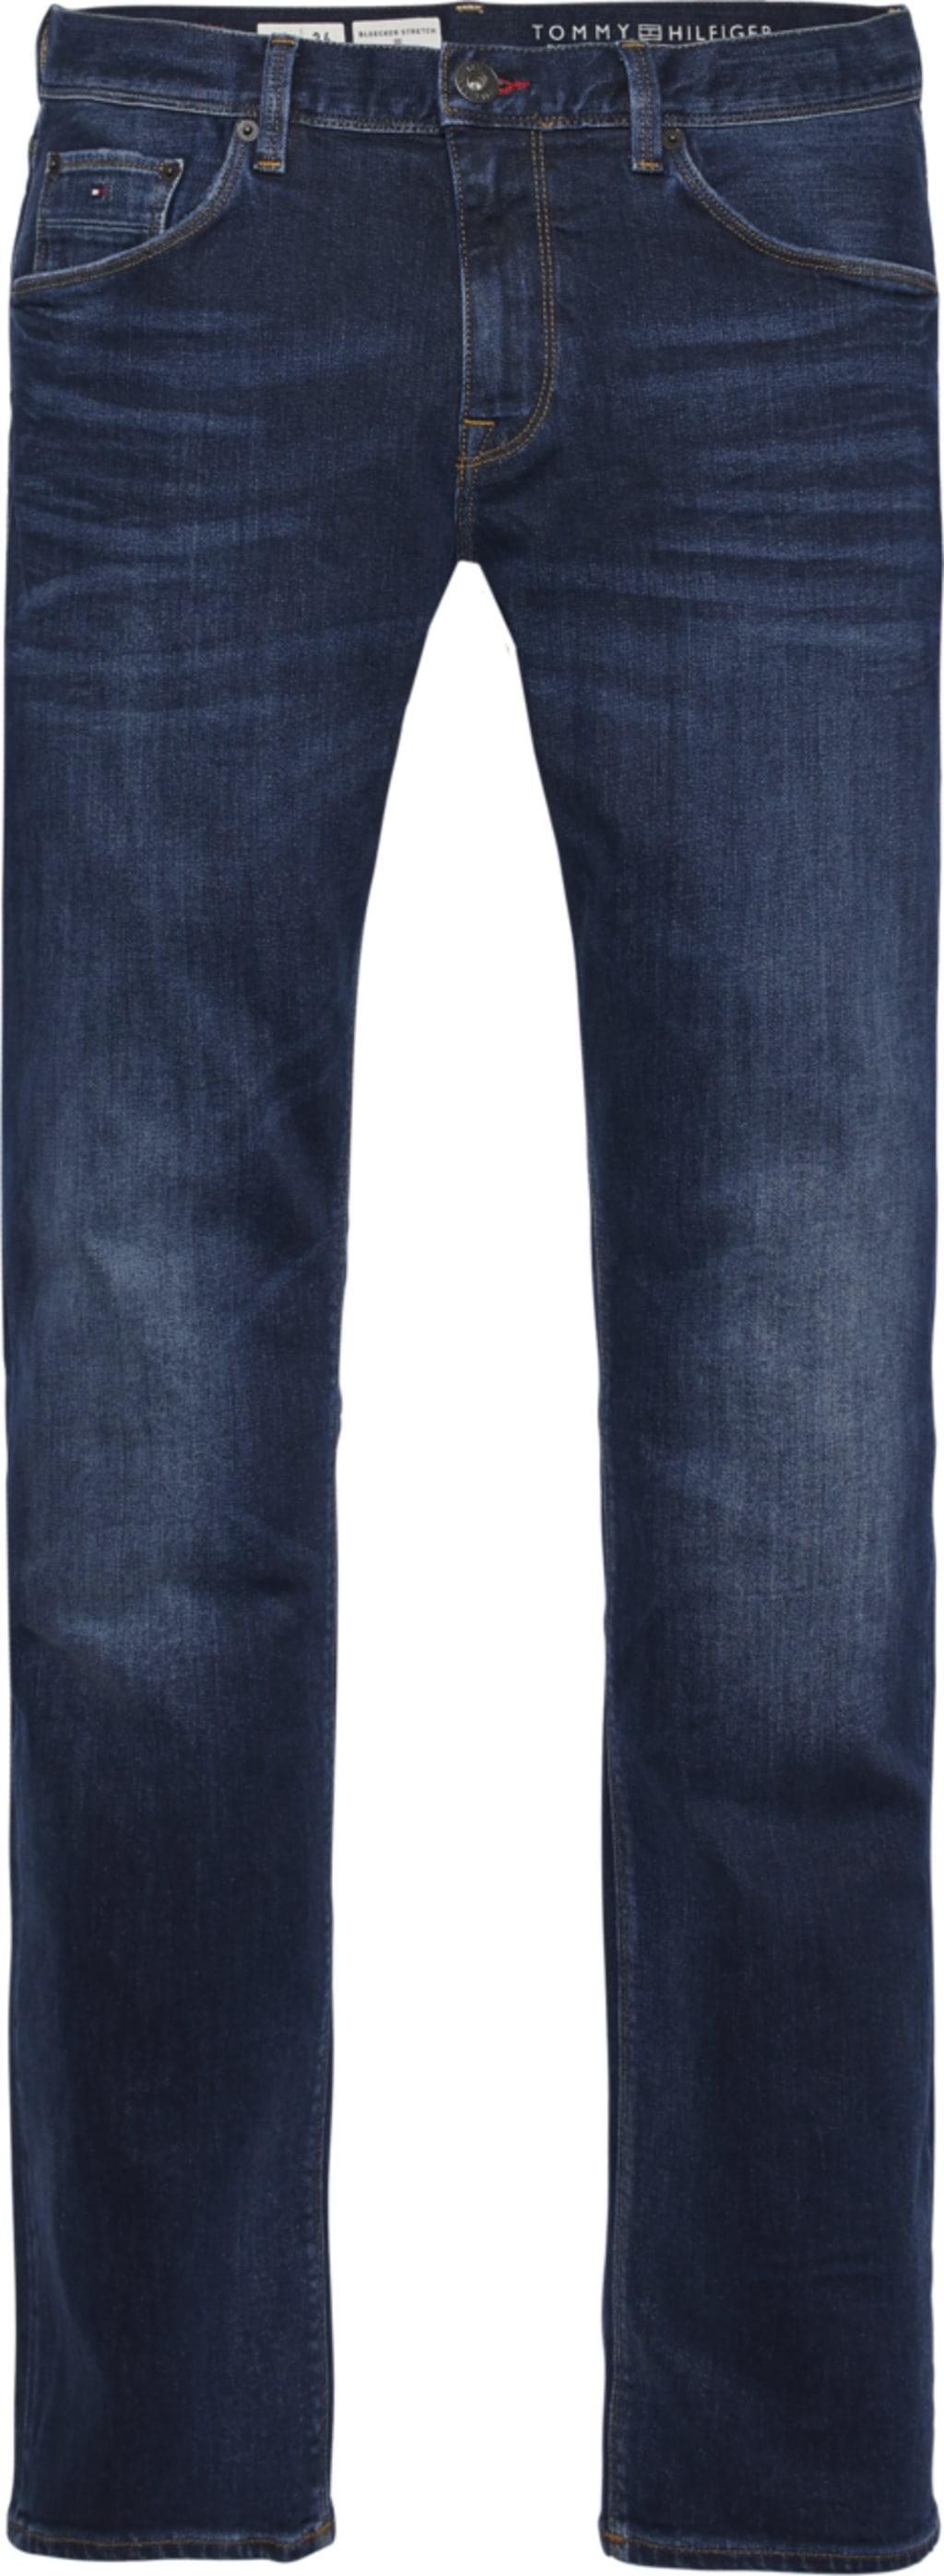 TOMMY HILFIGER Slim-fit-Jeans CORE BLEECKER SLIM JEANS blau Herren Slim Fit Jeans